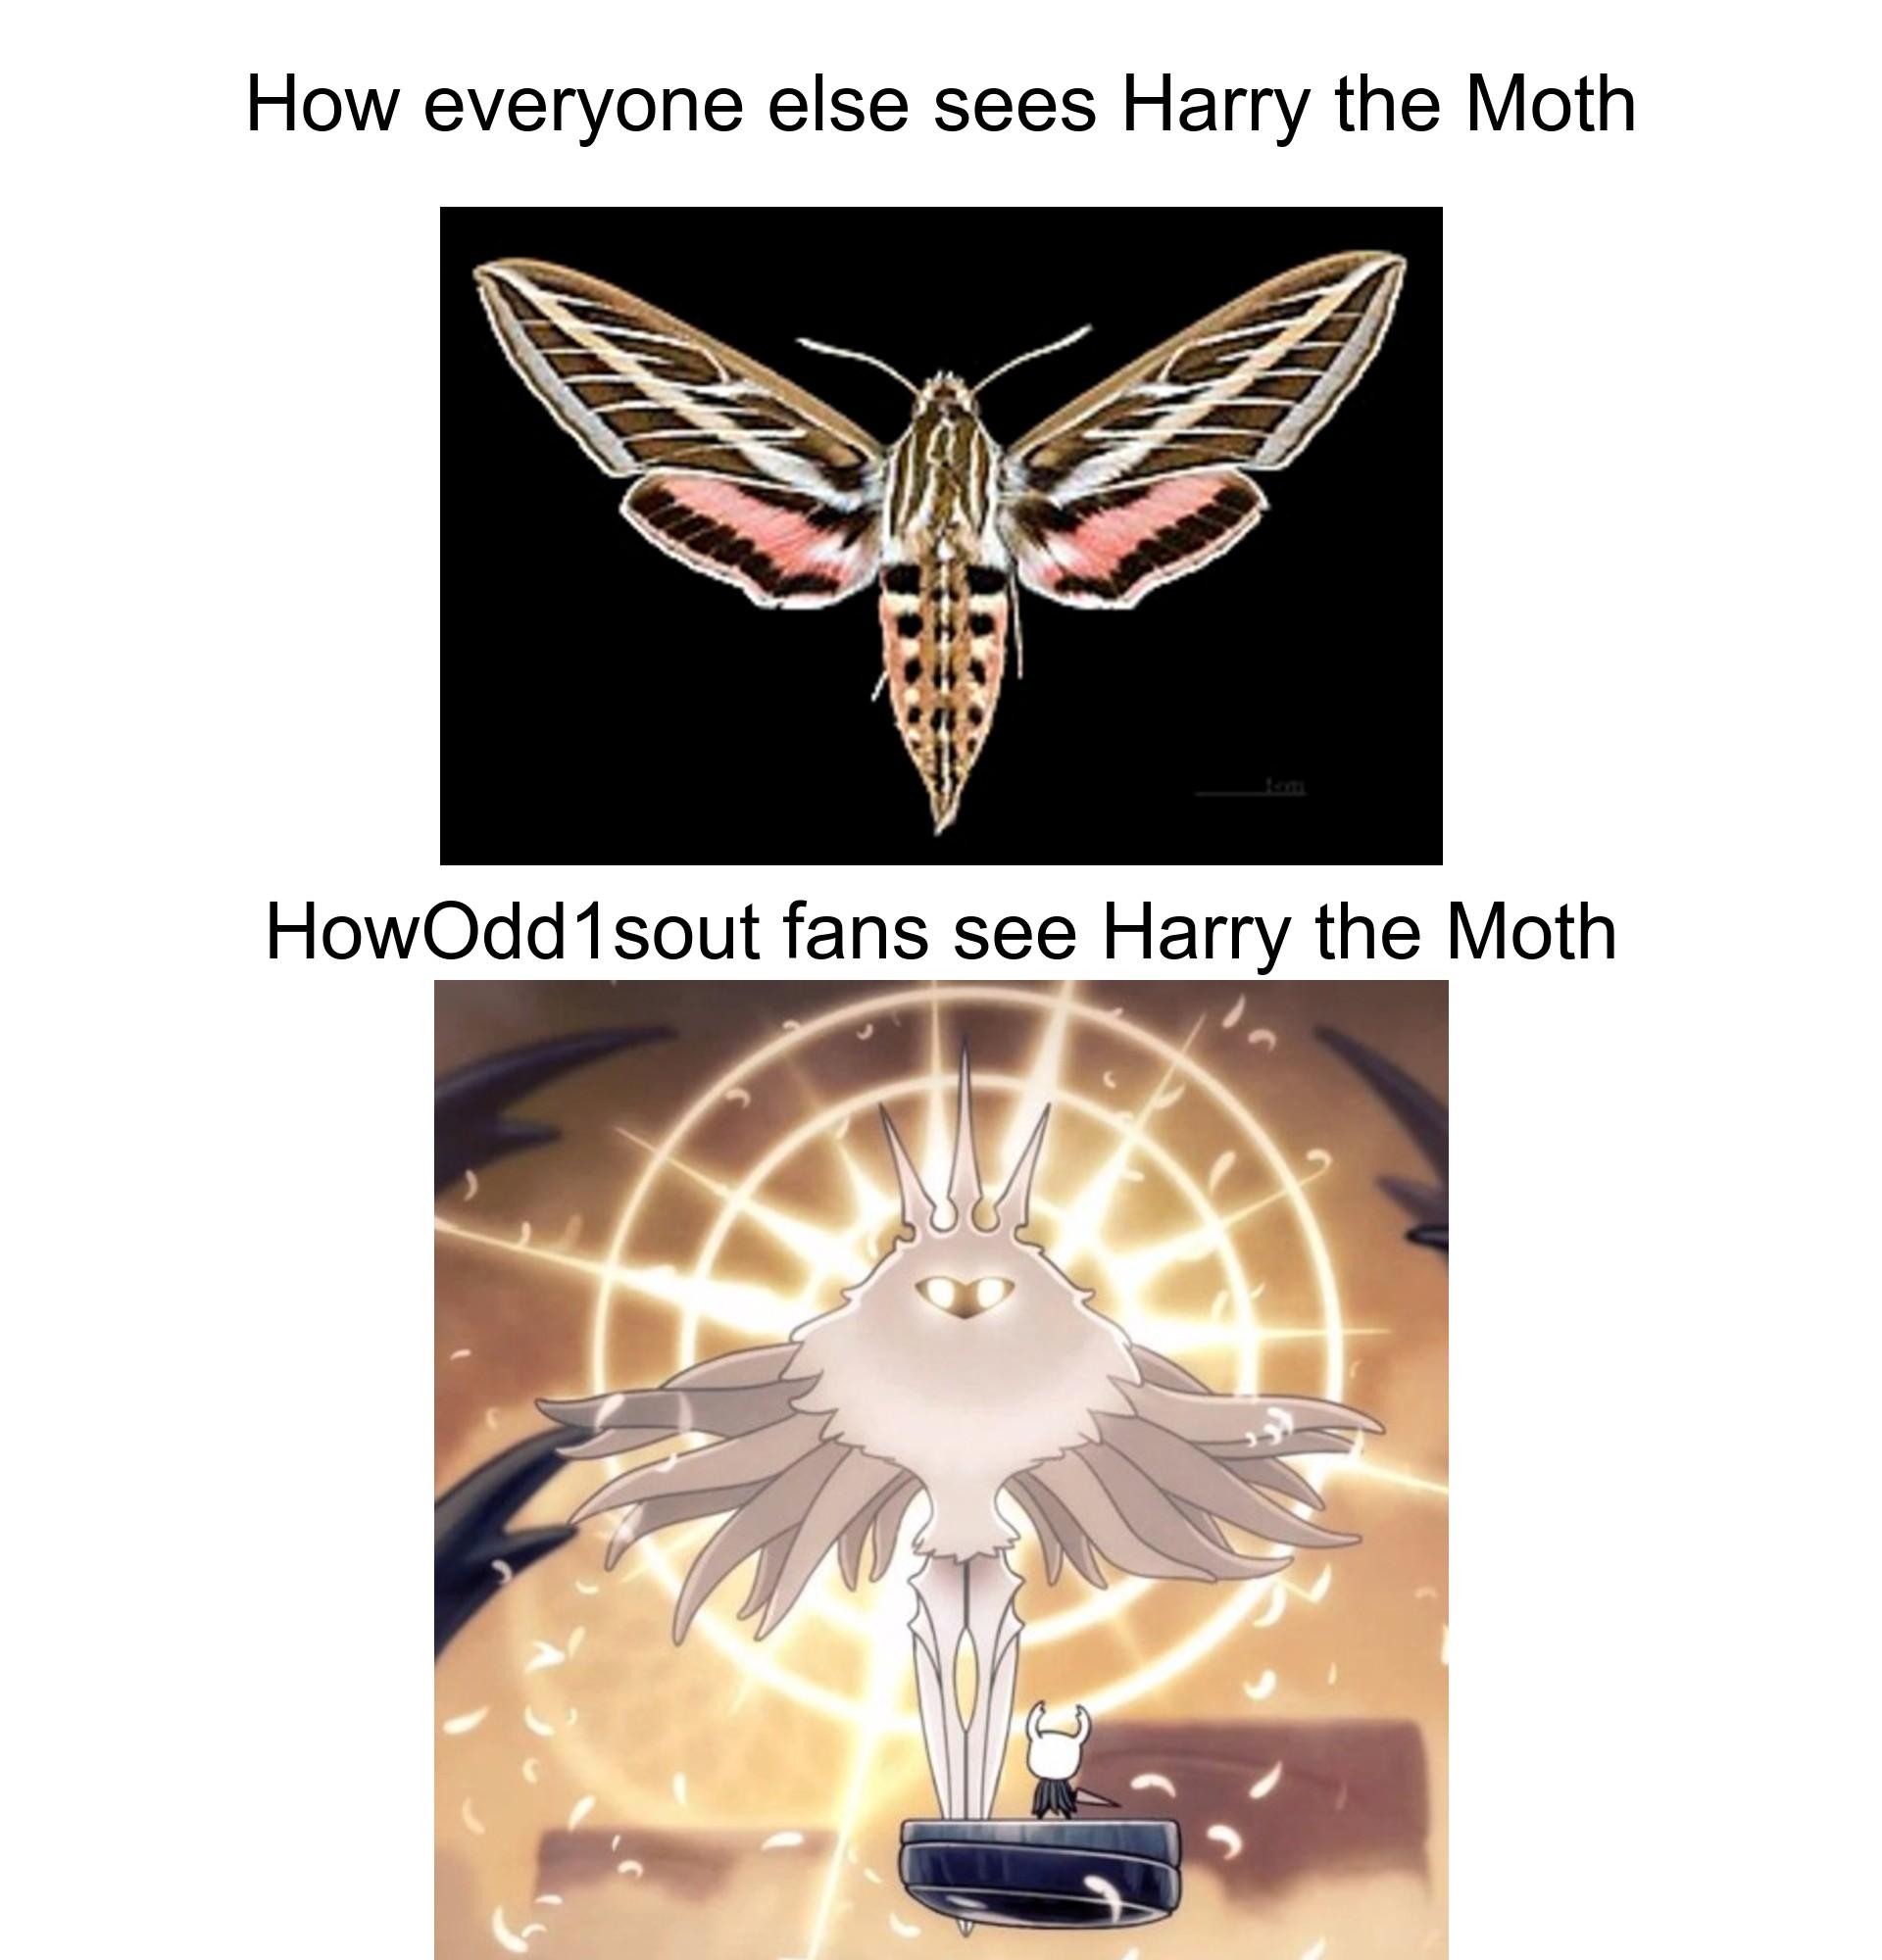 My Fantasy Reacting To The Moth Meme Lately 9gag